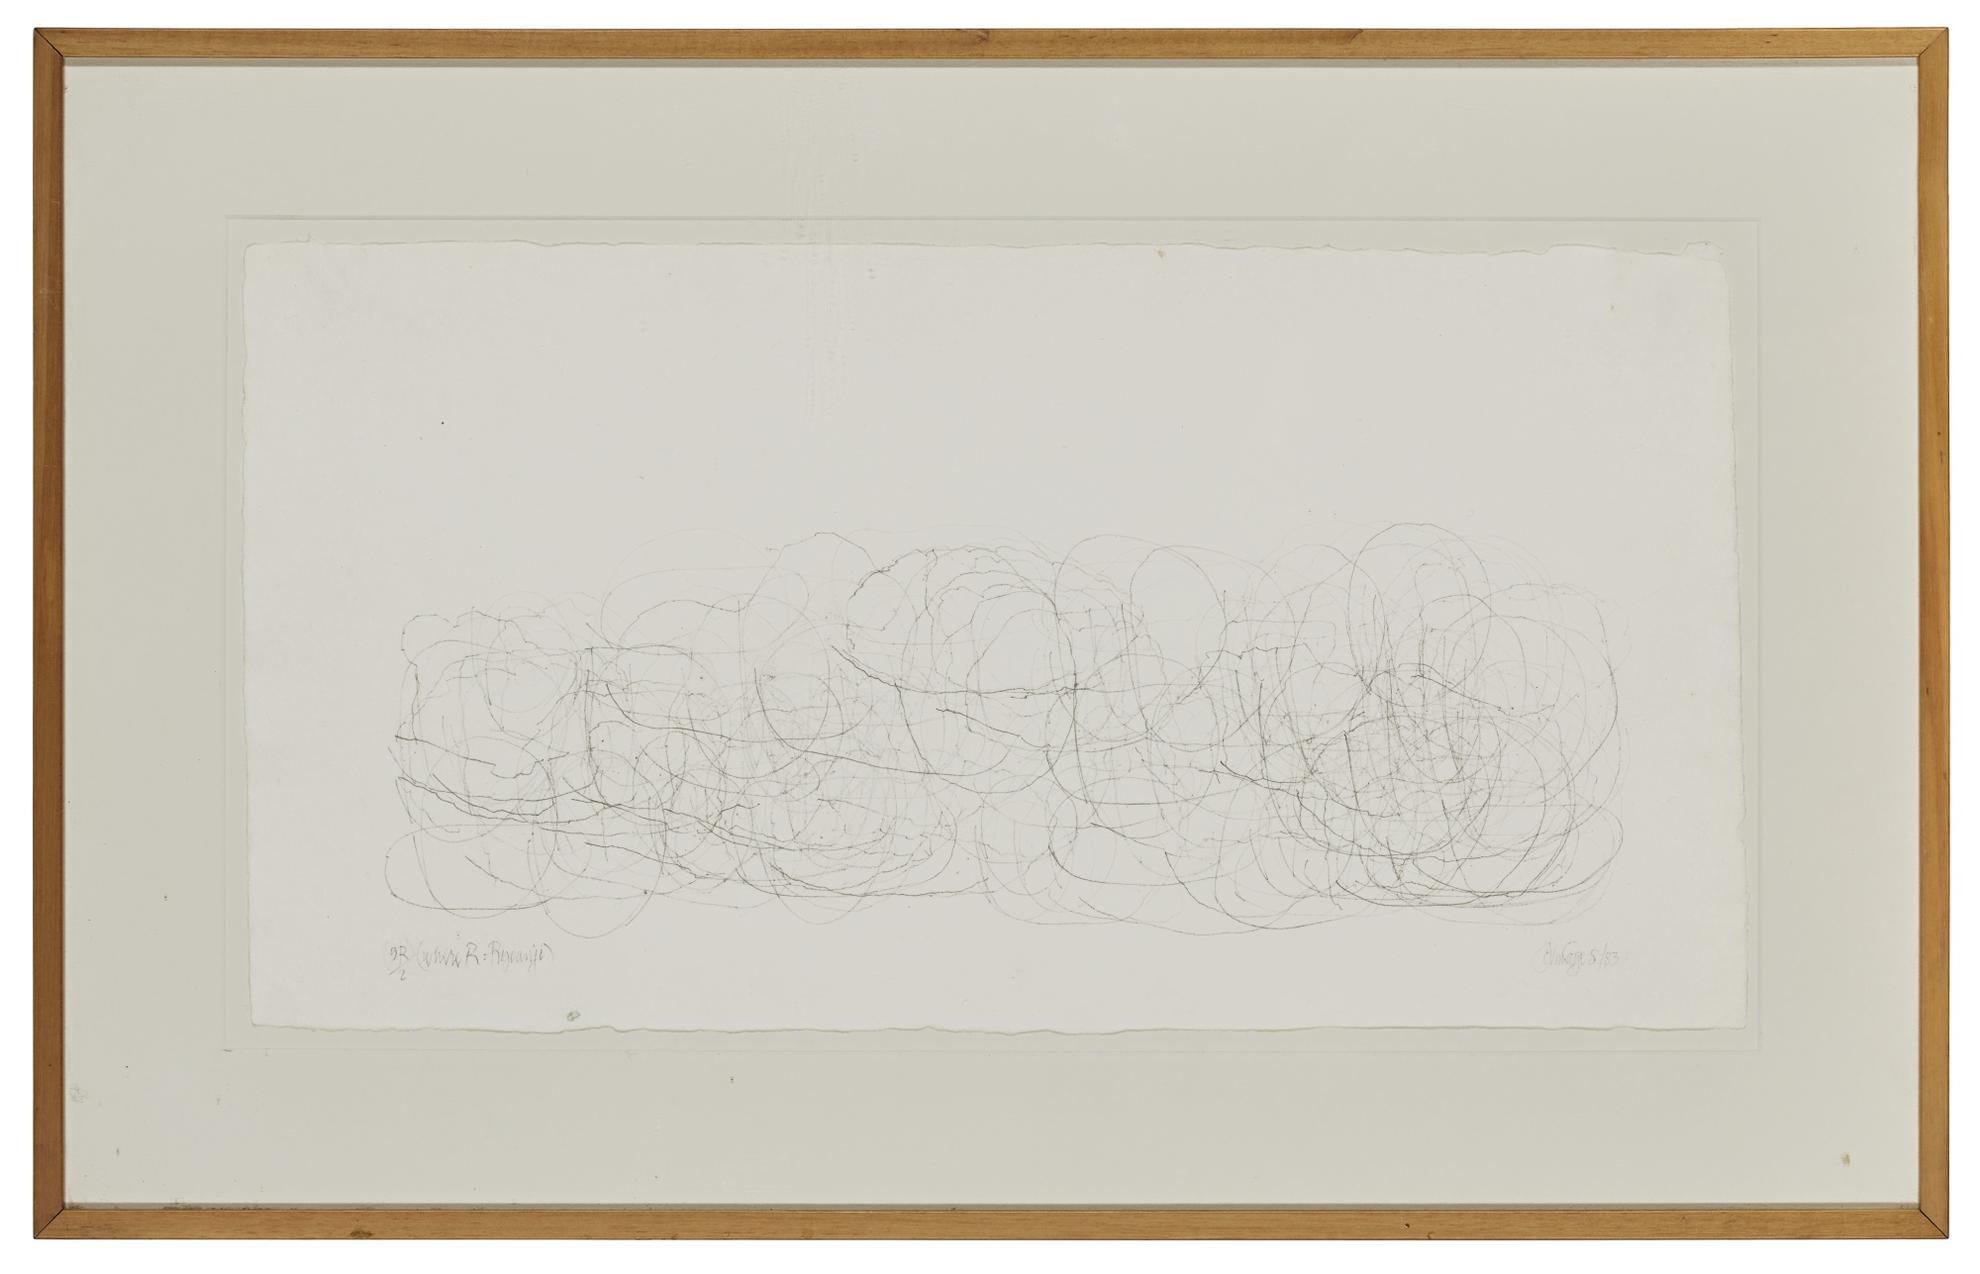 John Cage-Where R=Ryoanji (9R)/2-1983